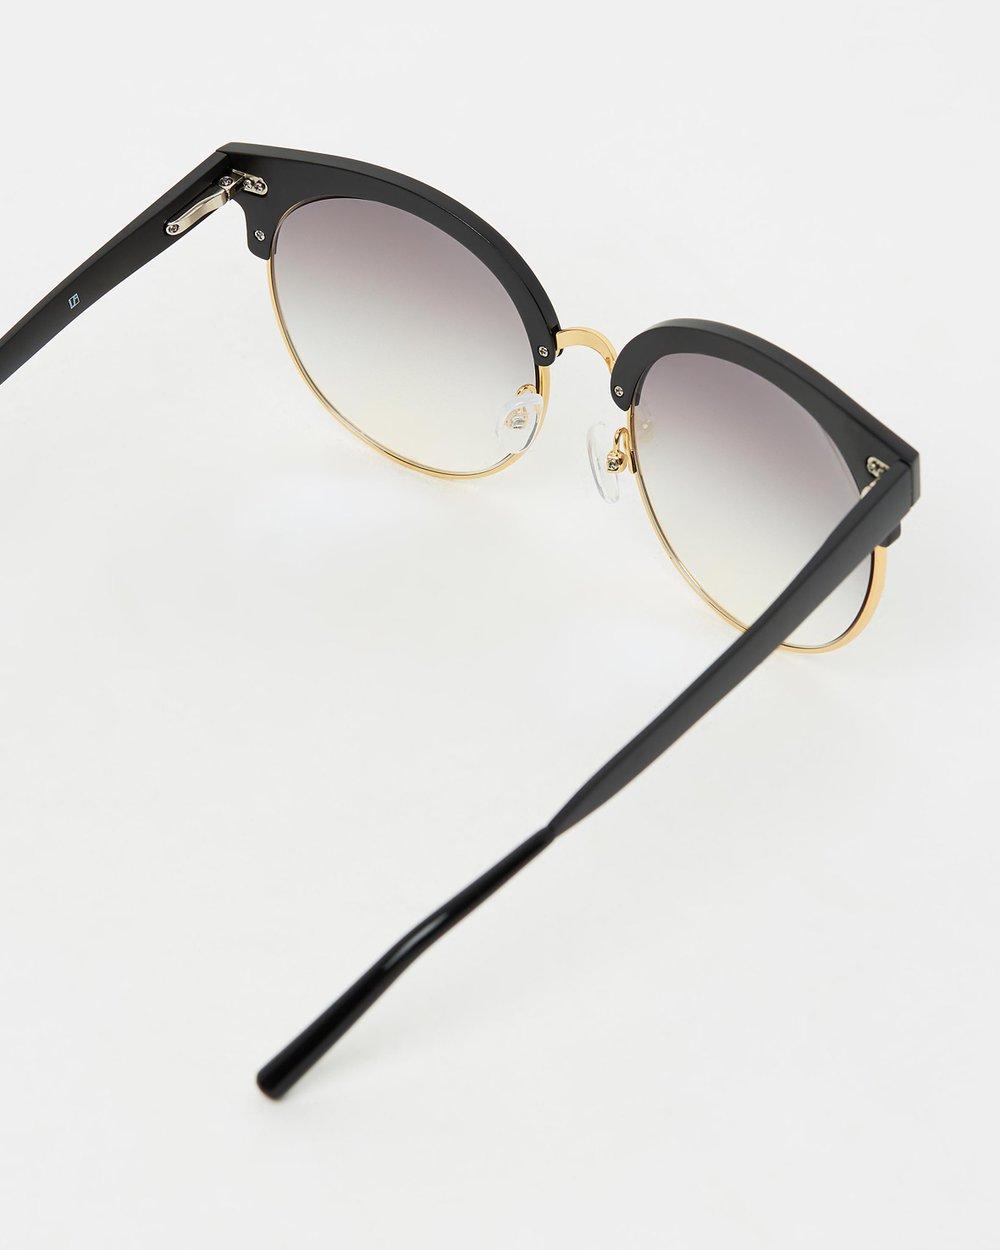 cb6b6288bddf 160 Cat Eye Sunglasses by Matthew Williamson Online